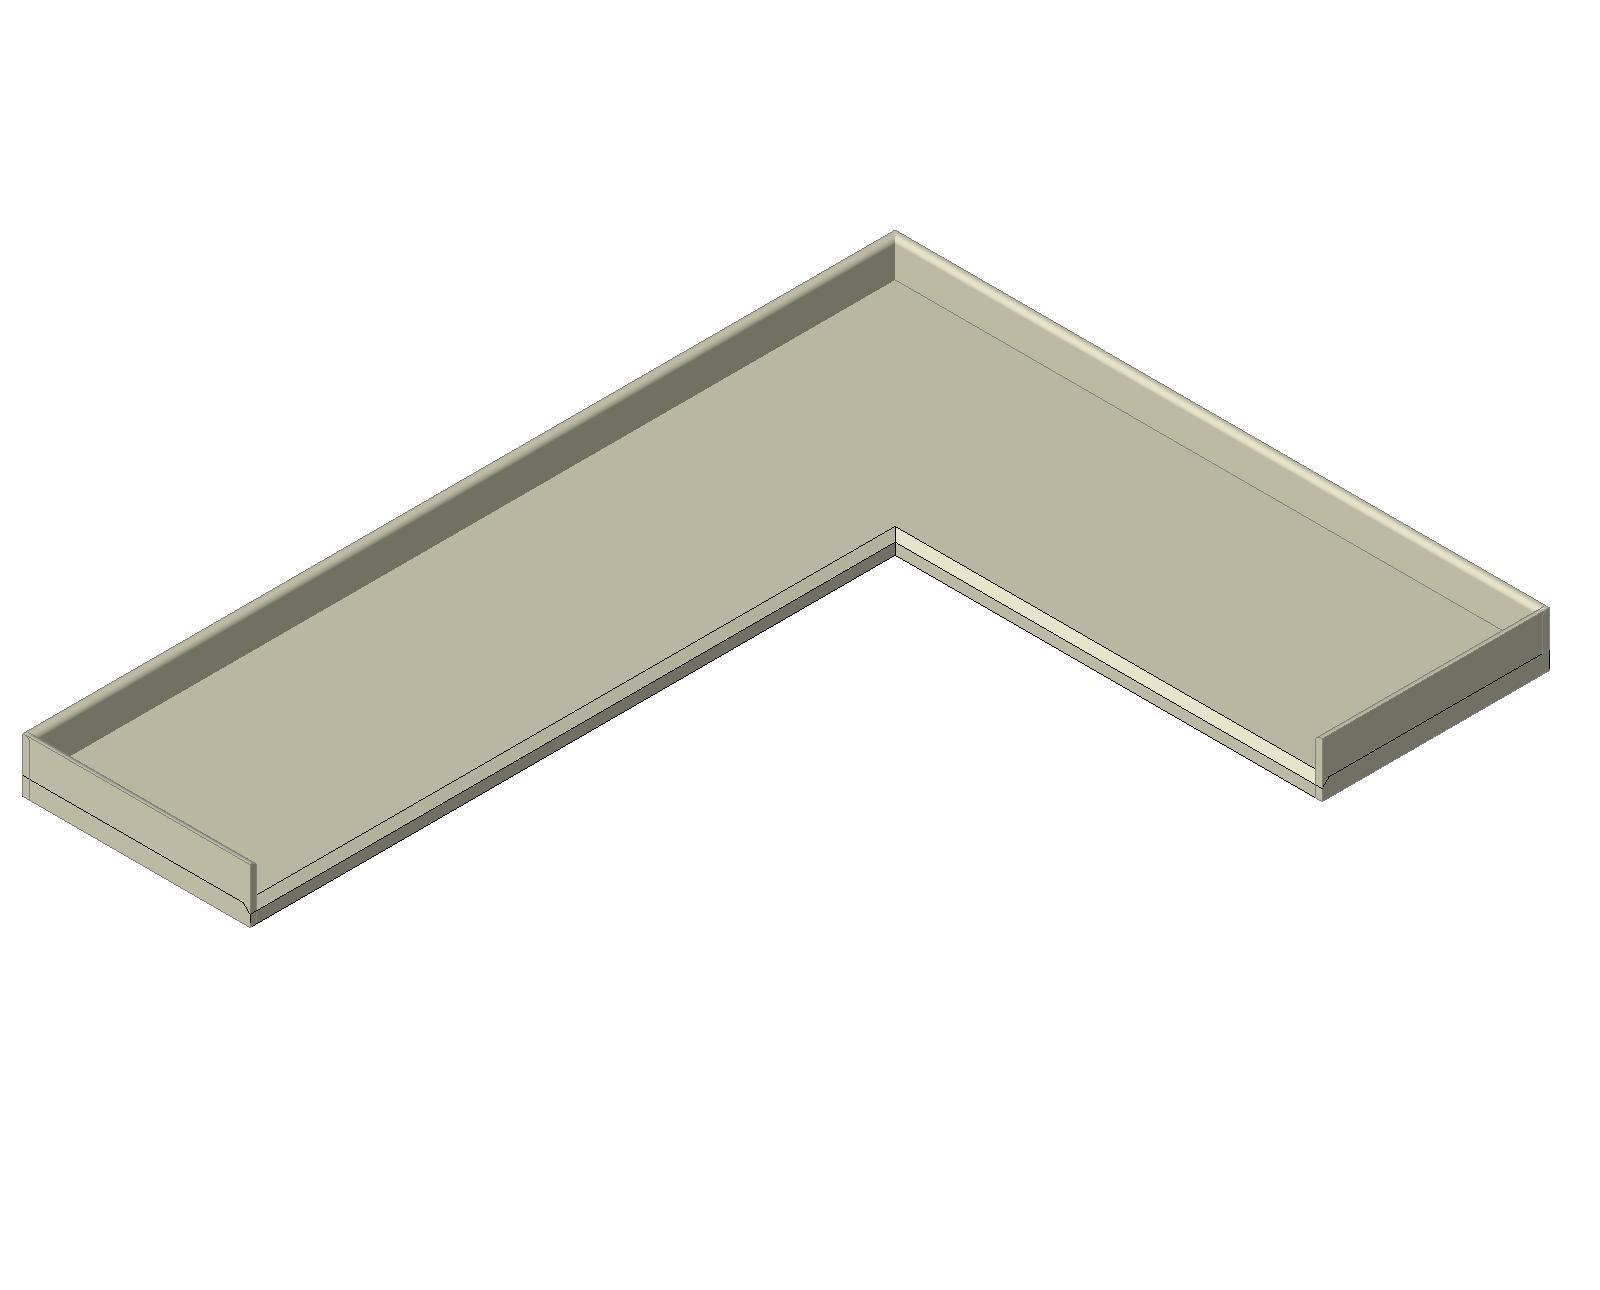 Countertop Material Revit : Generic Countertops BIM Objects / Families